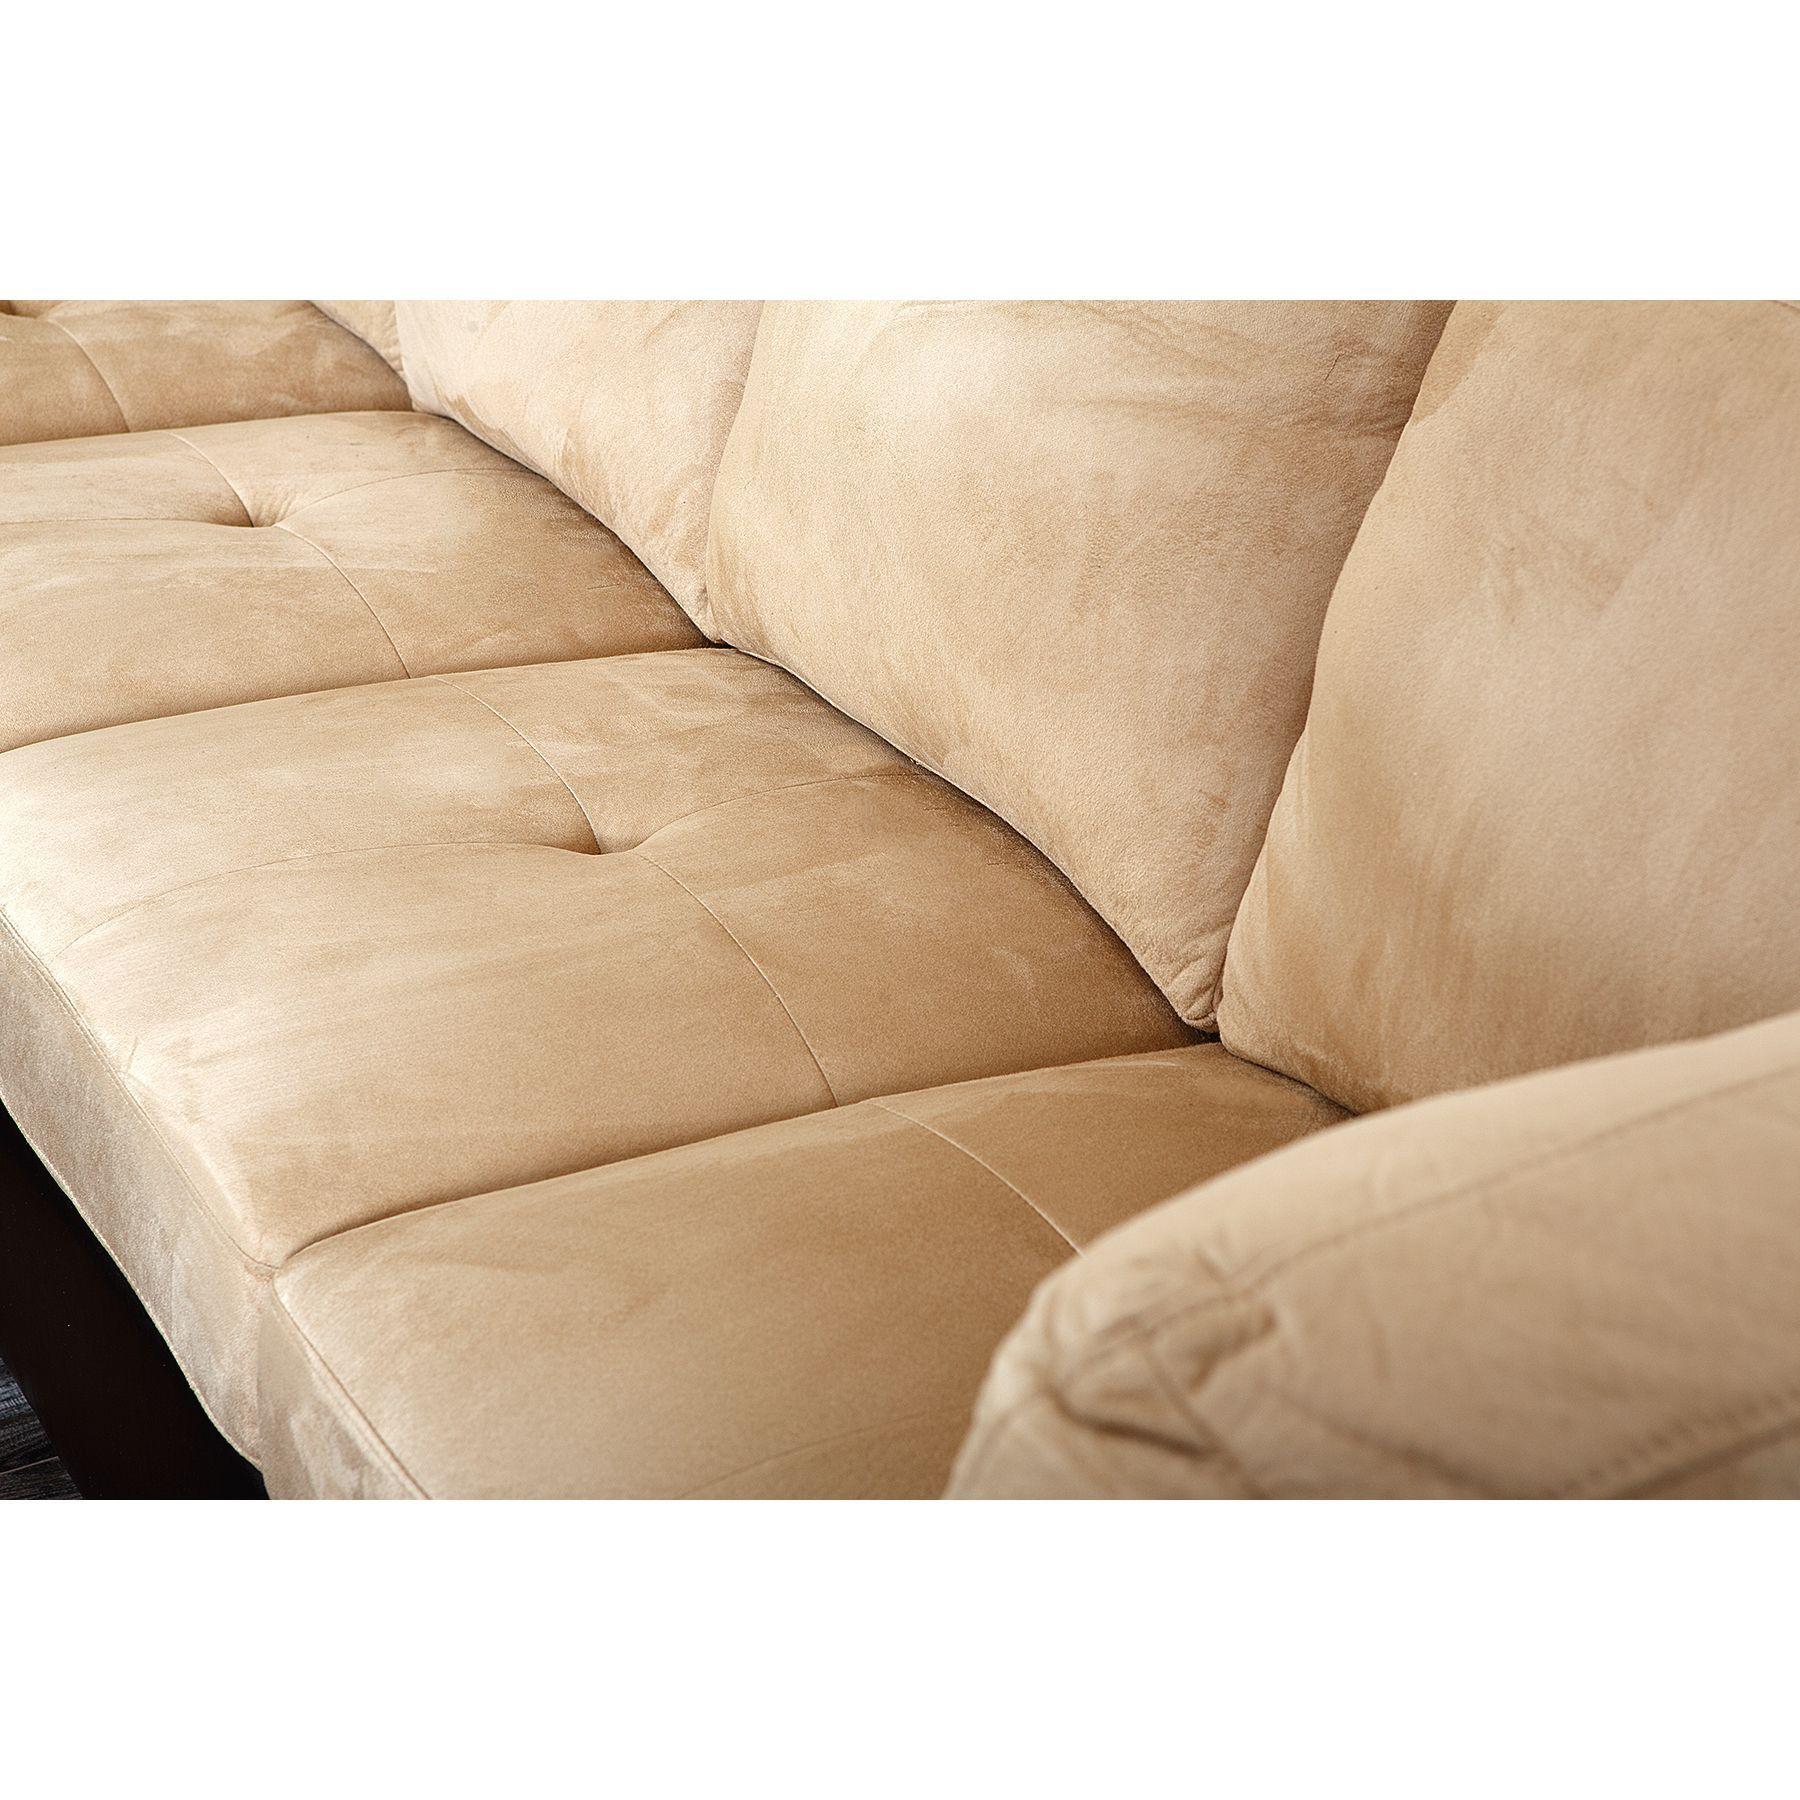 Charlotte Beige Sectional Sofa And Ottoman Dark Brown Beige